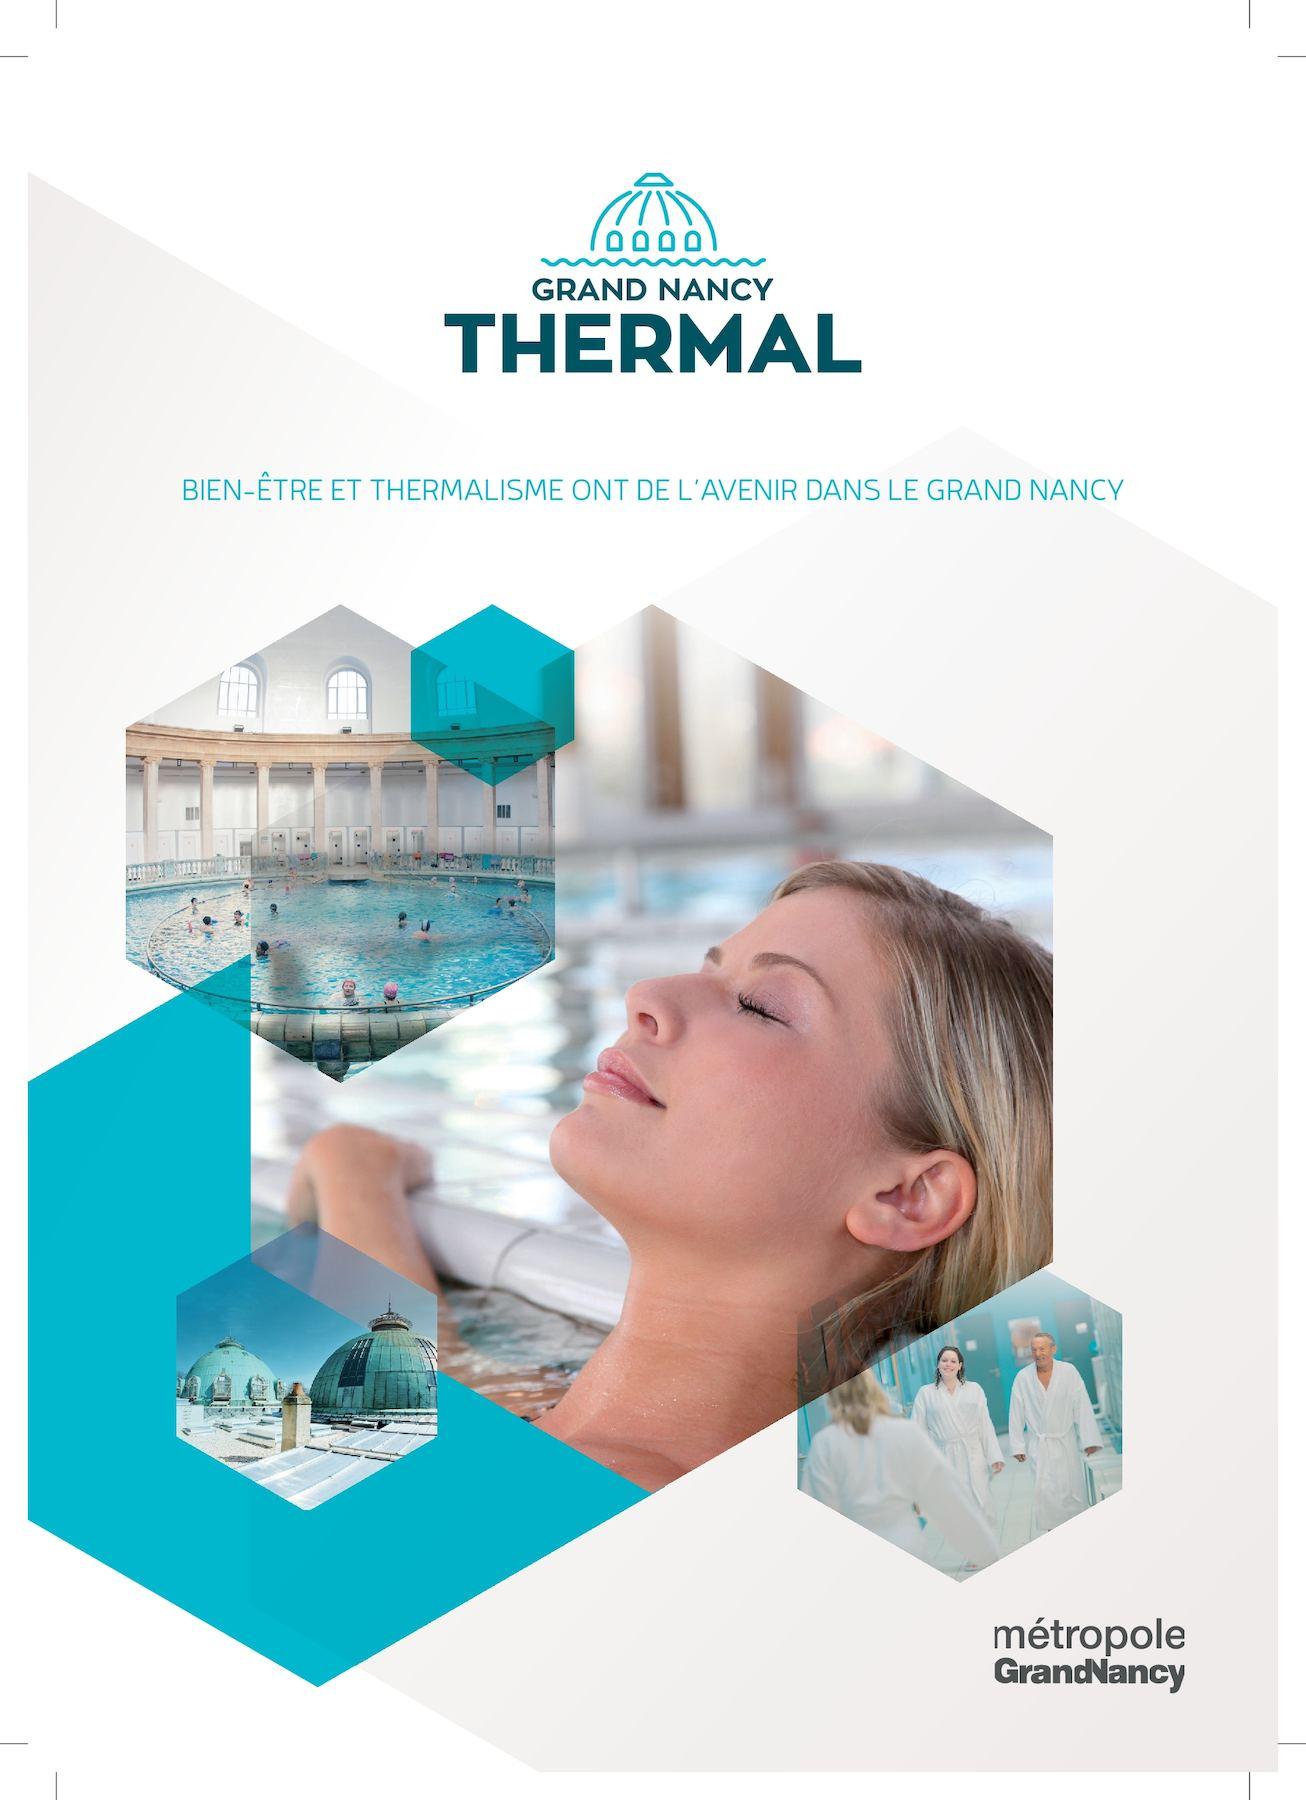 Calam o grand nancy thermal for Pole aquatique nancy